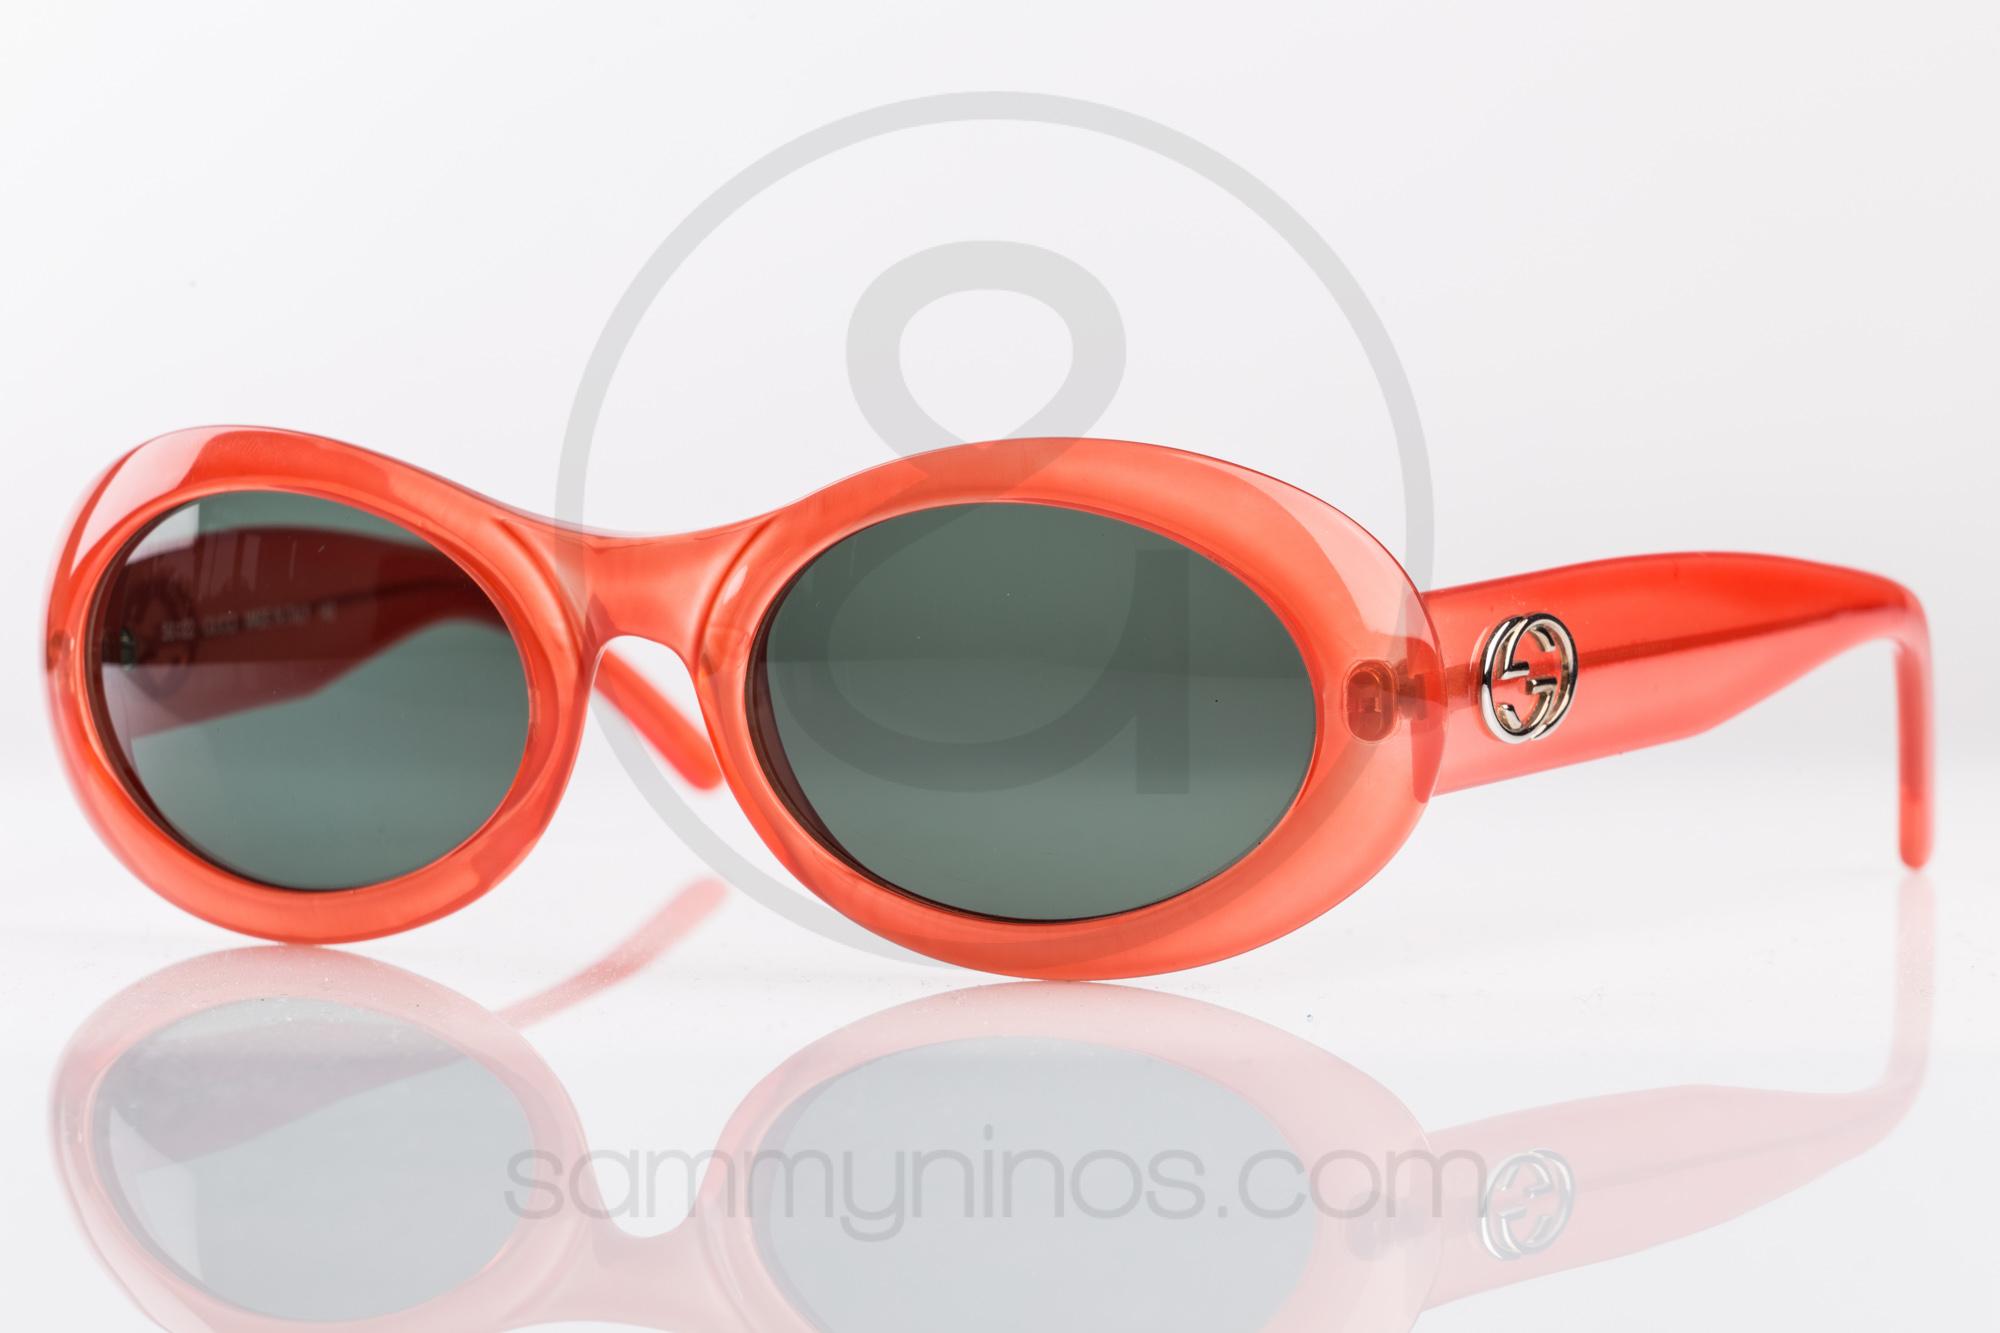 ae058d3b632 Gucci GG 2400 N S – Sammy   Nino s Store